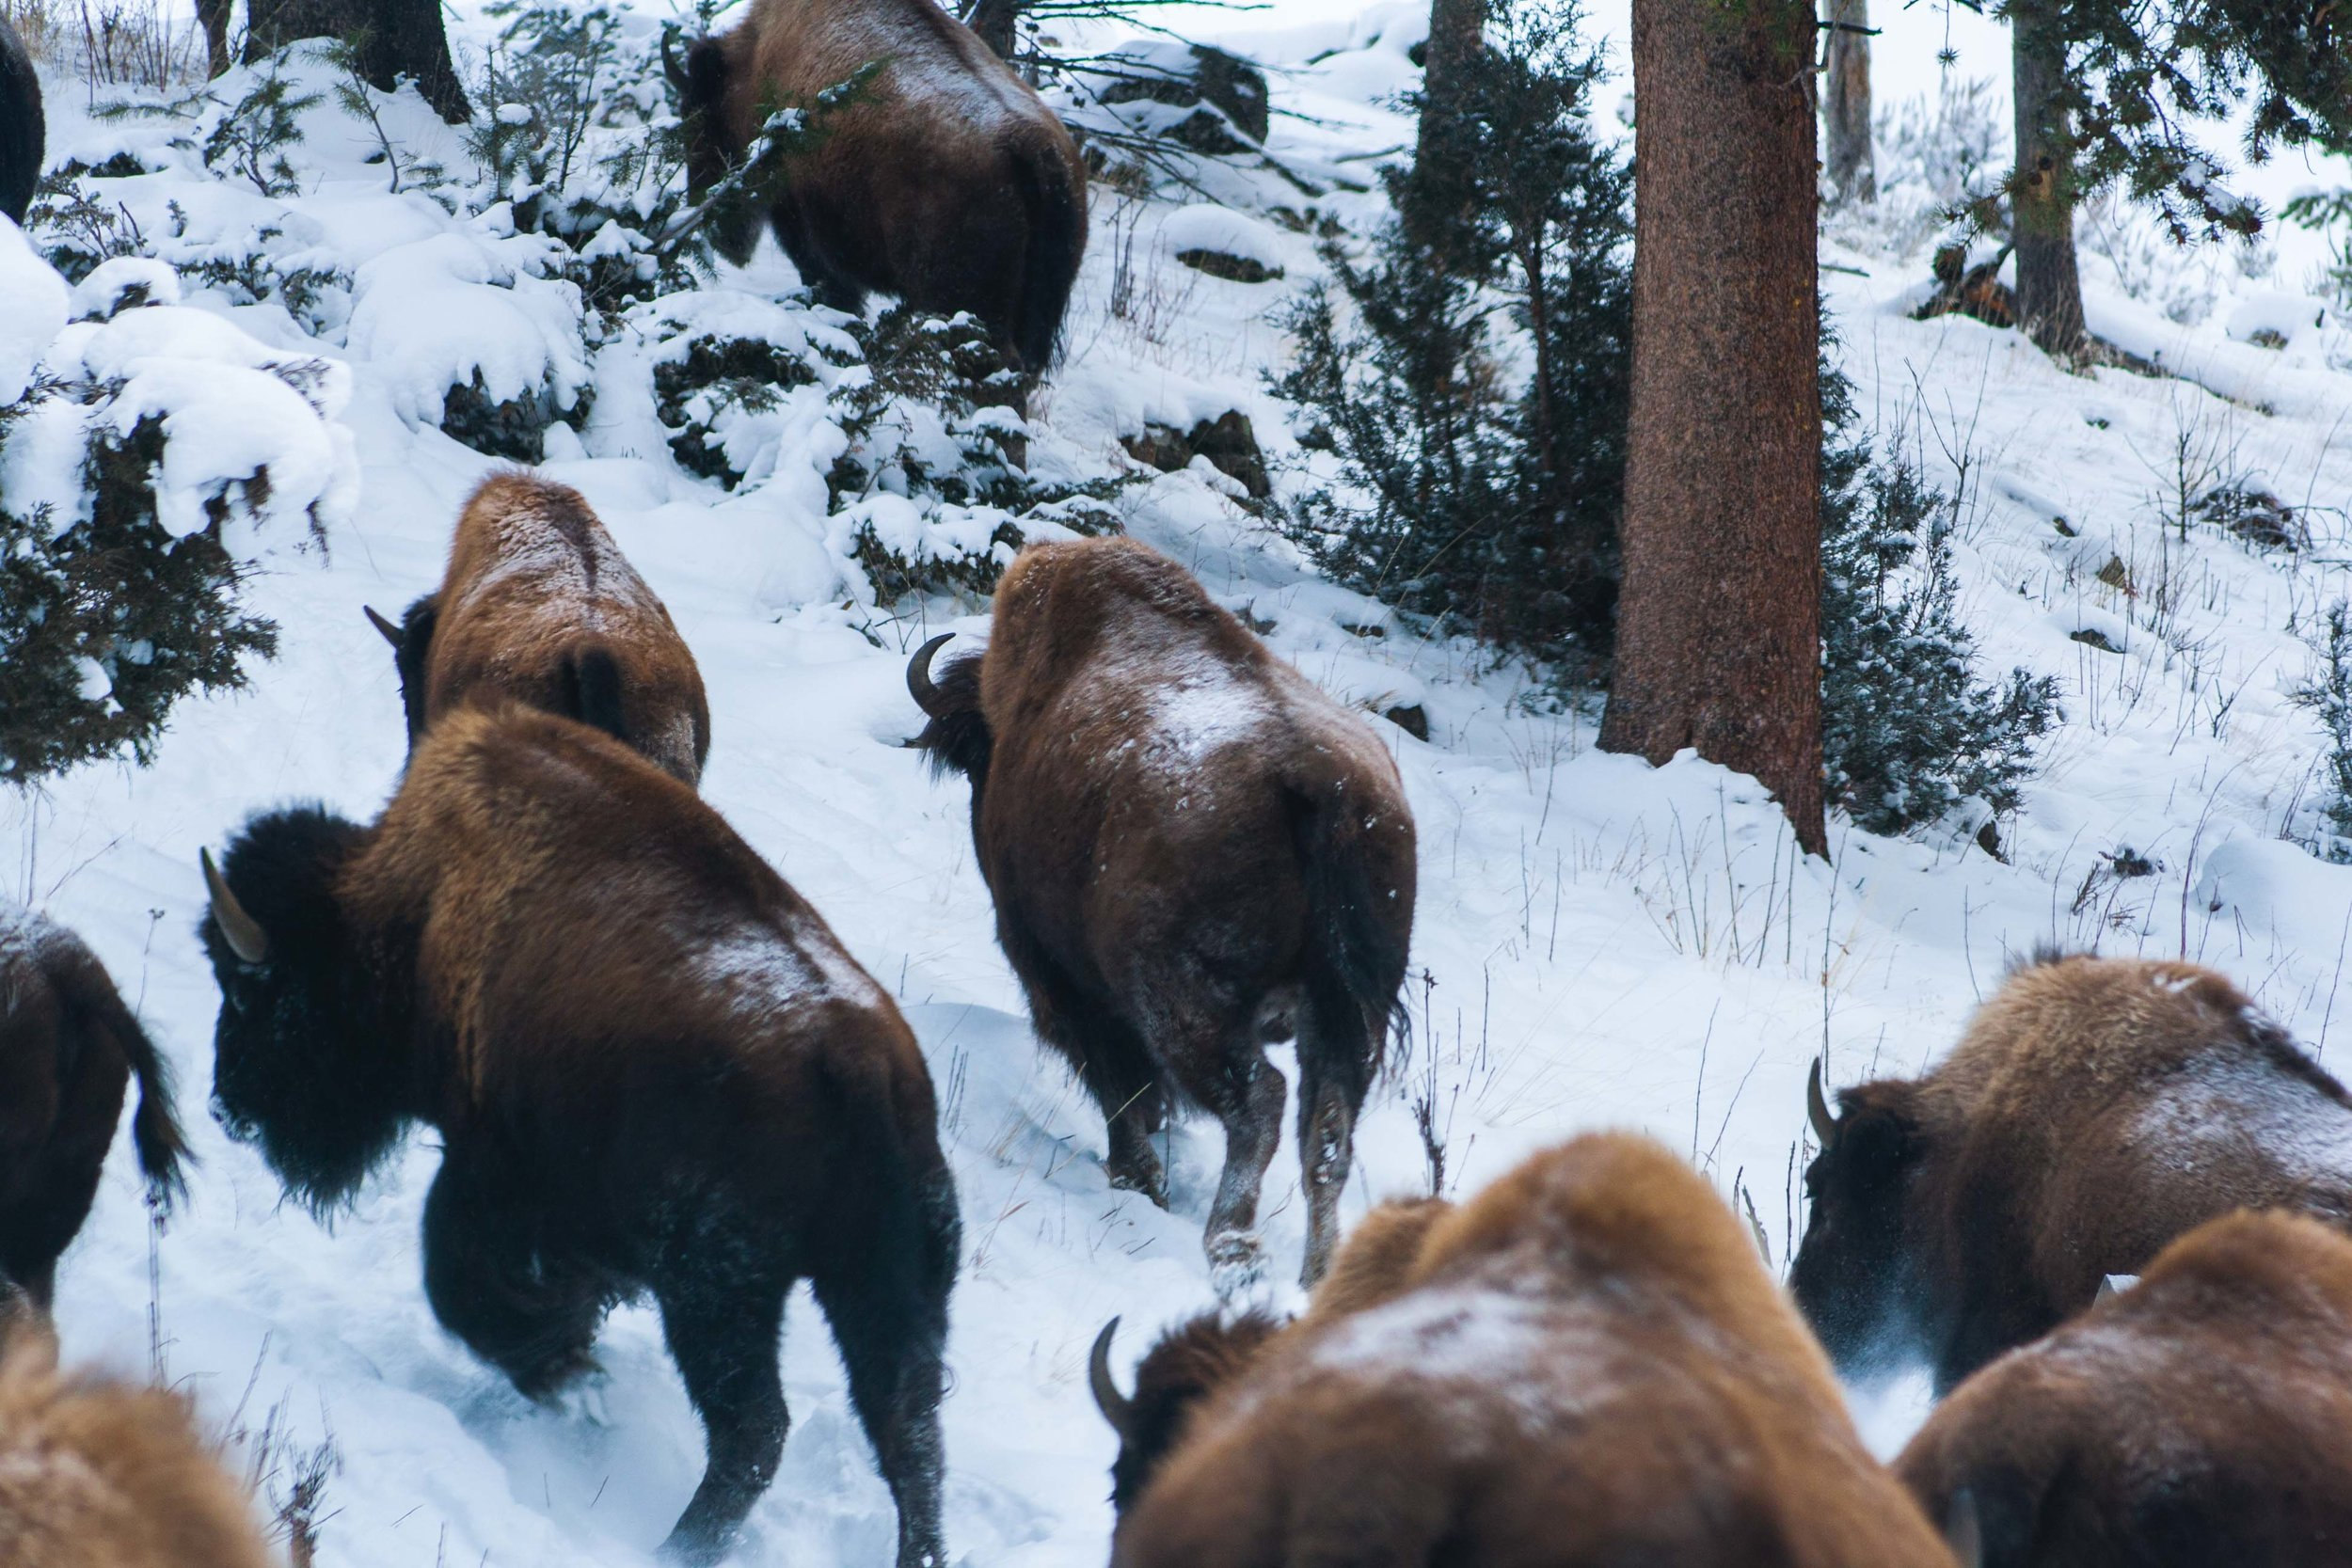 Yellowstone National Park, Wyoming. December 2014